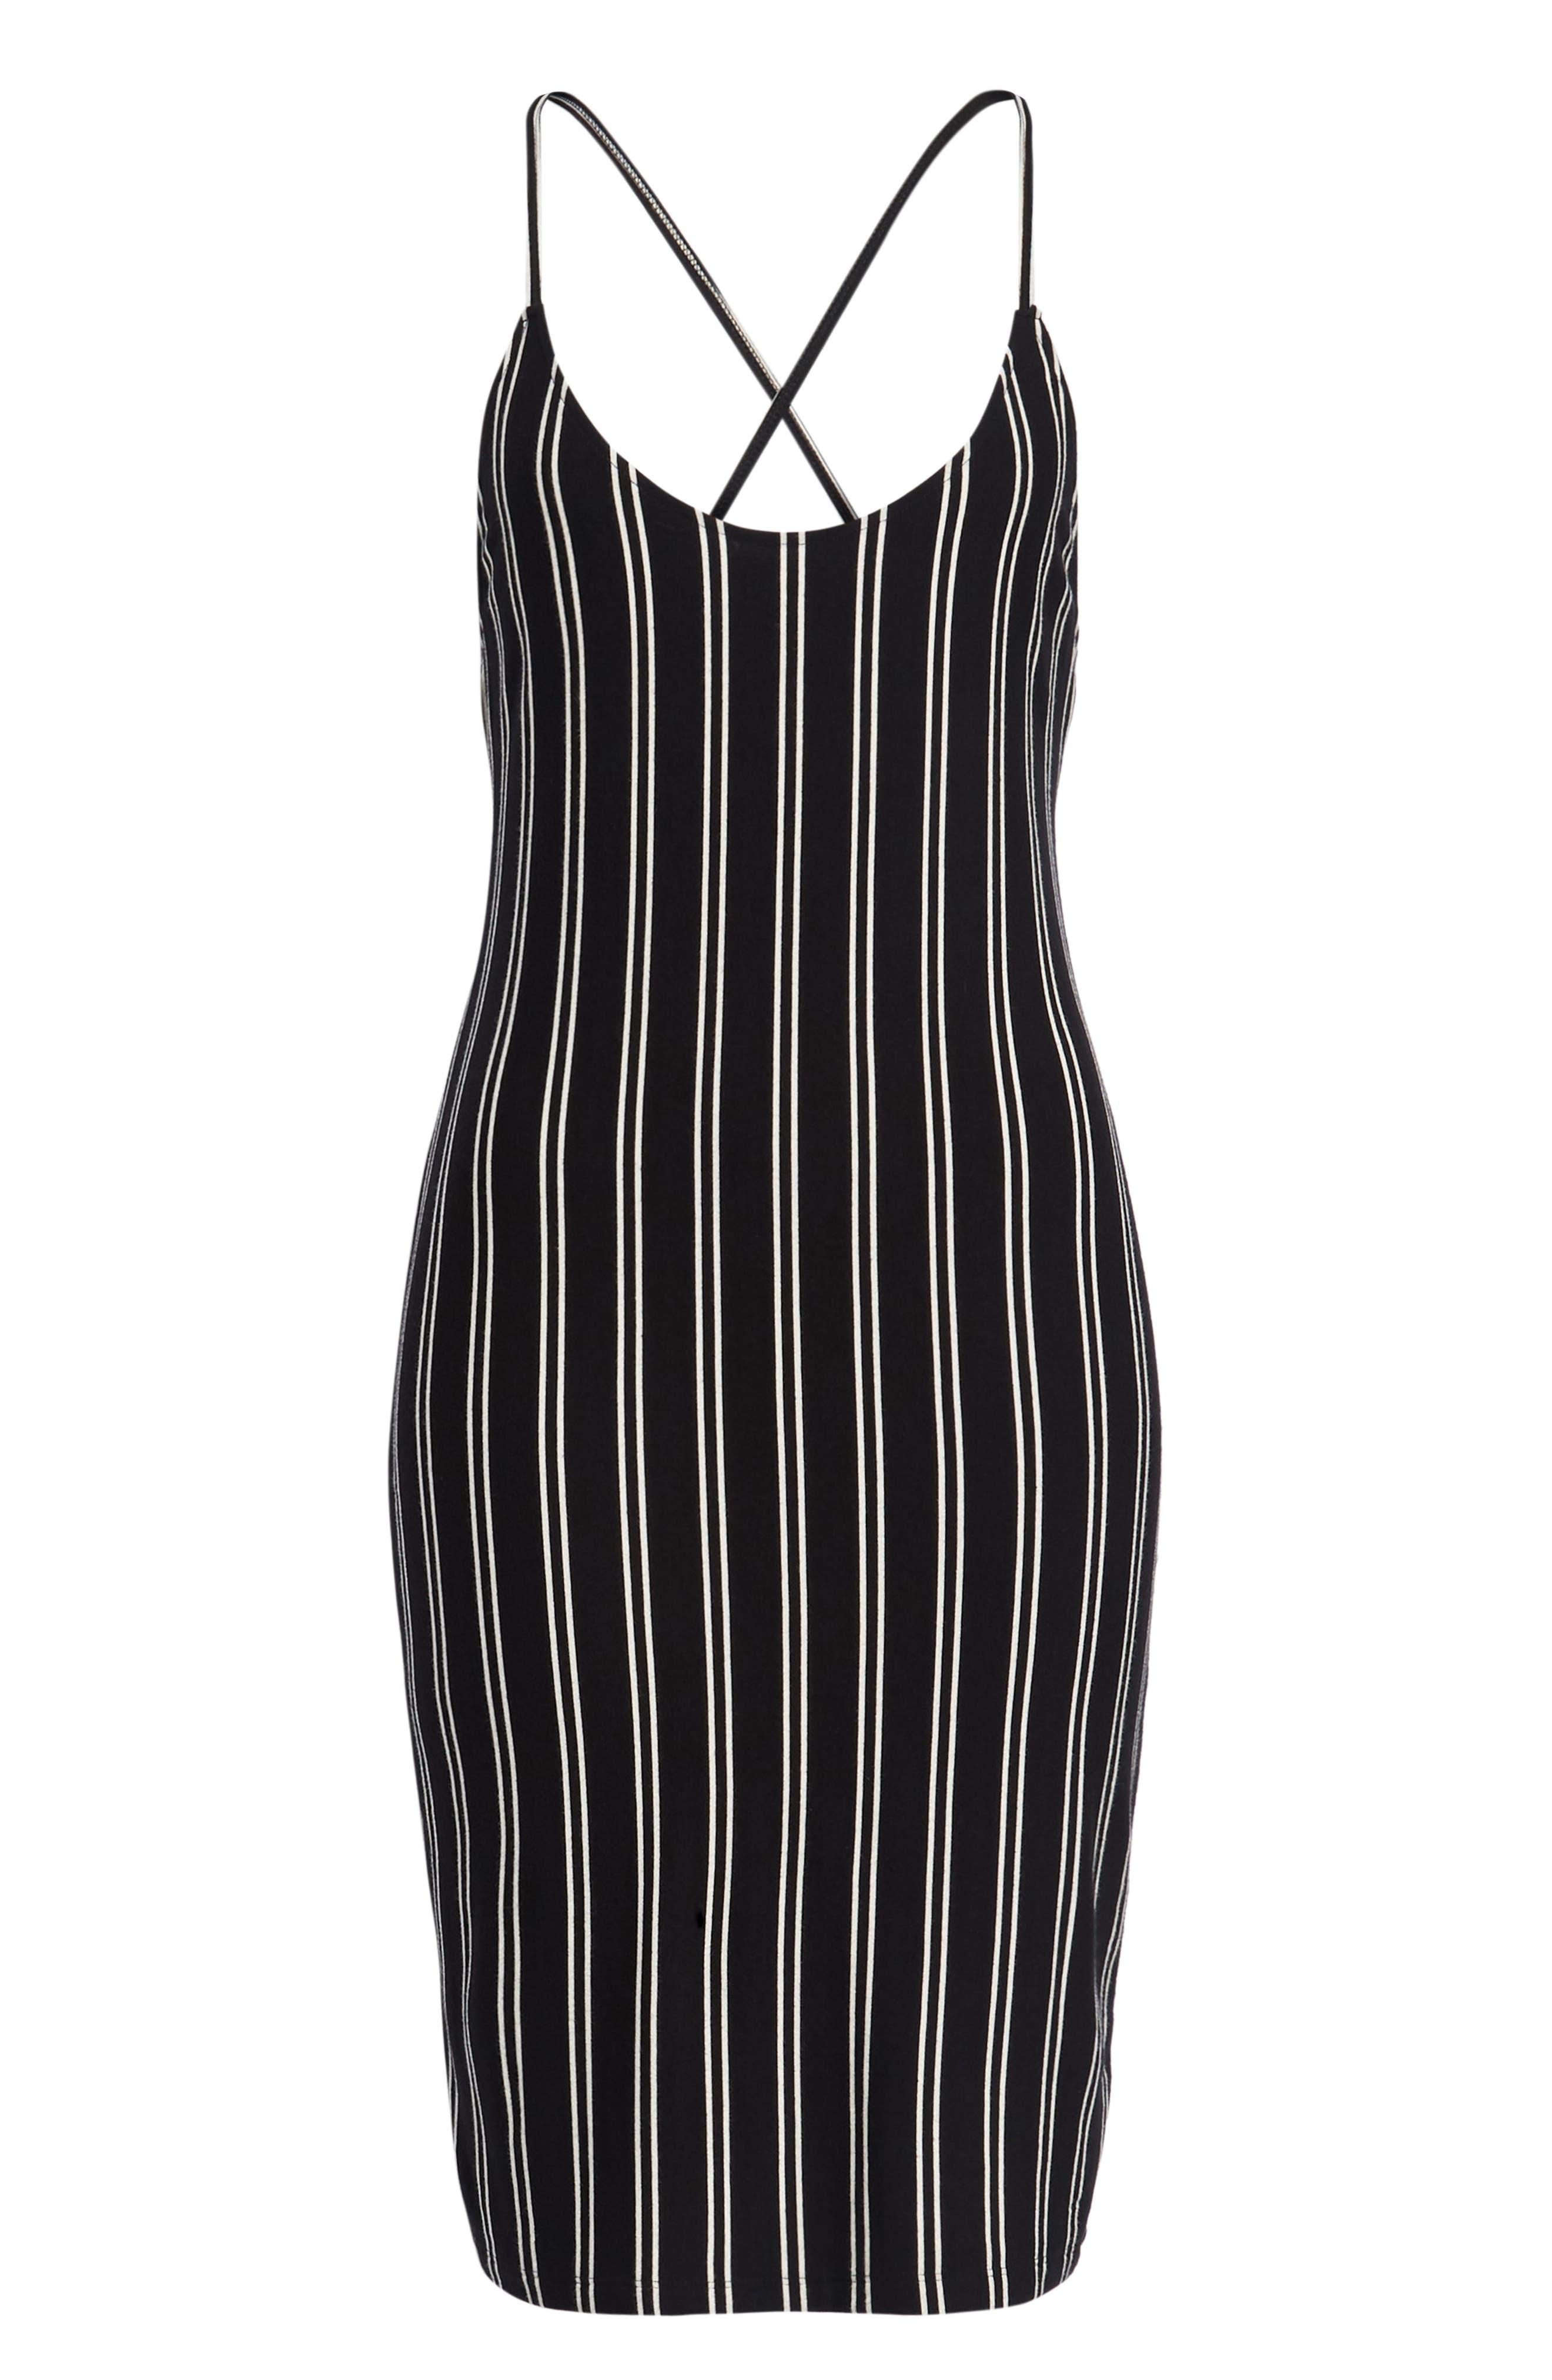 Lockette Strappy Striped Dress,                             Alternate thumbnail 7, color,                             Jet Black Multi